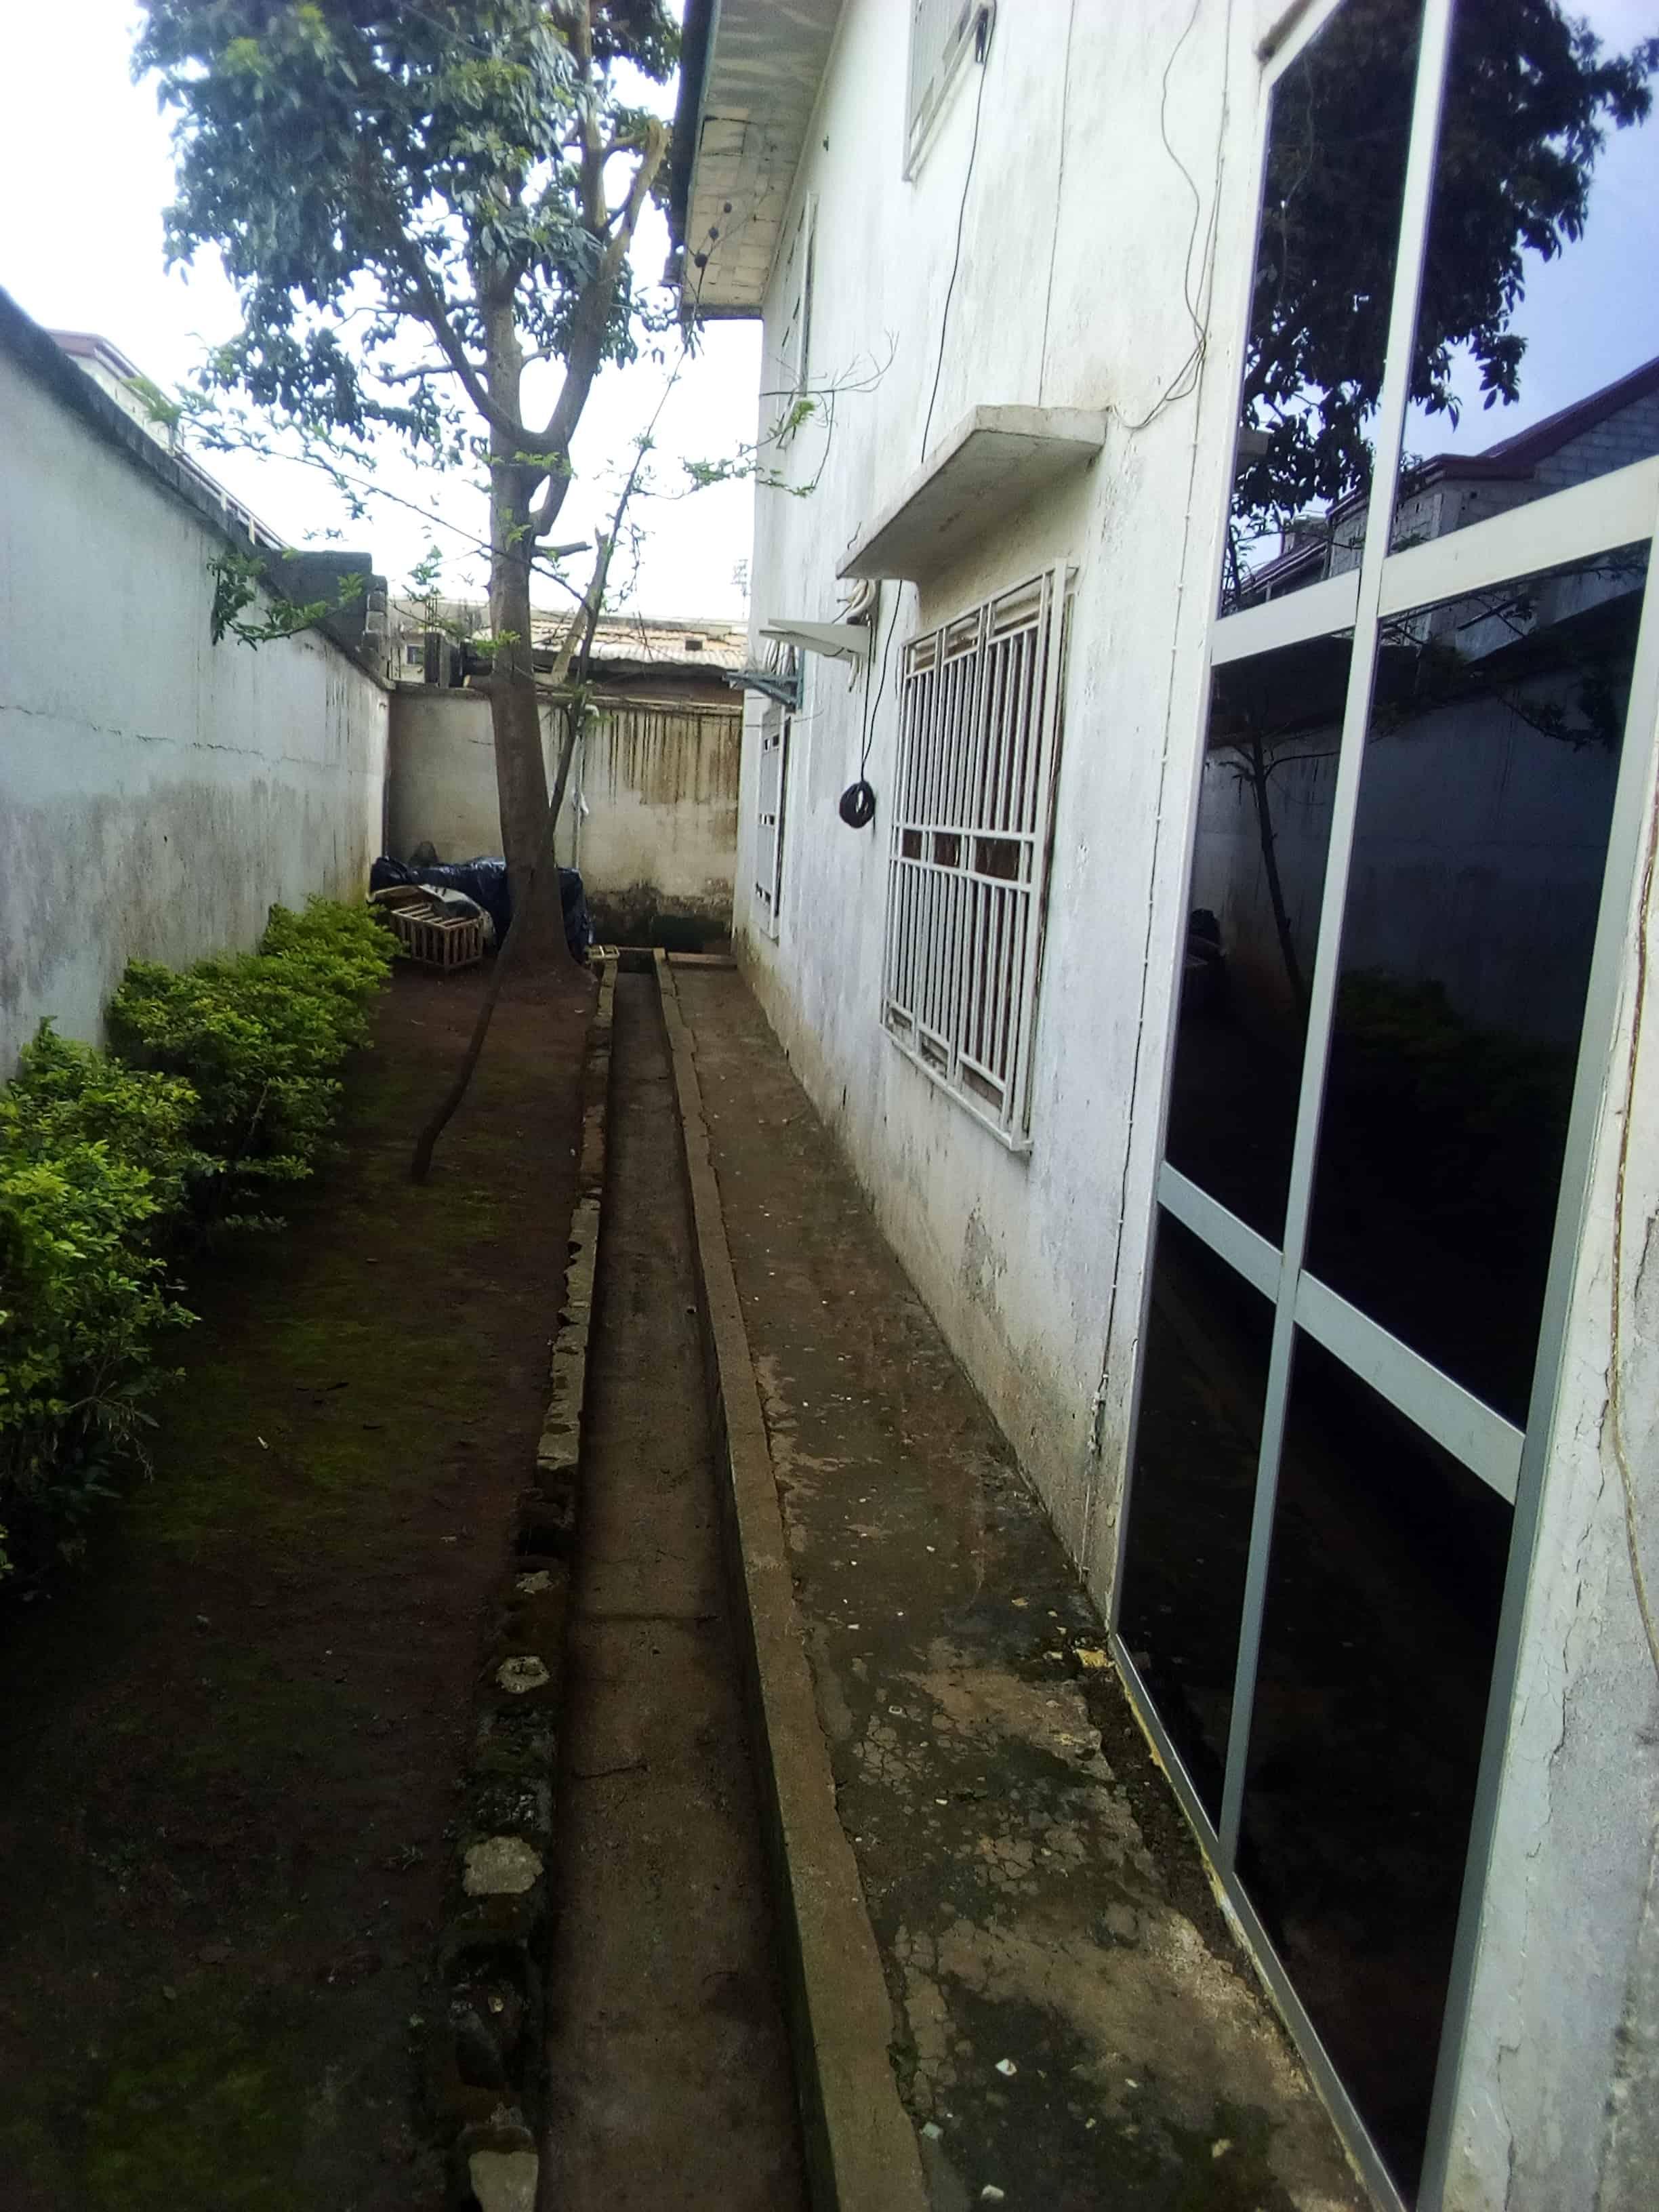 House (Duplex) to rent - Yaoundé, Mfandena, OMNISPORT - 1 living room(s), 5 bedroom(s), 4 bathroom(s) - 500 000 FCFA / month